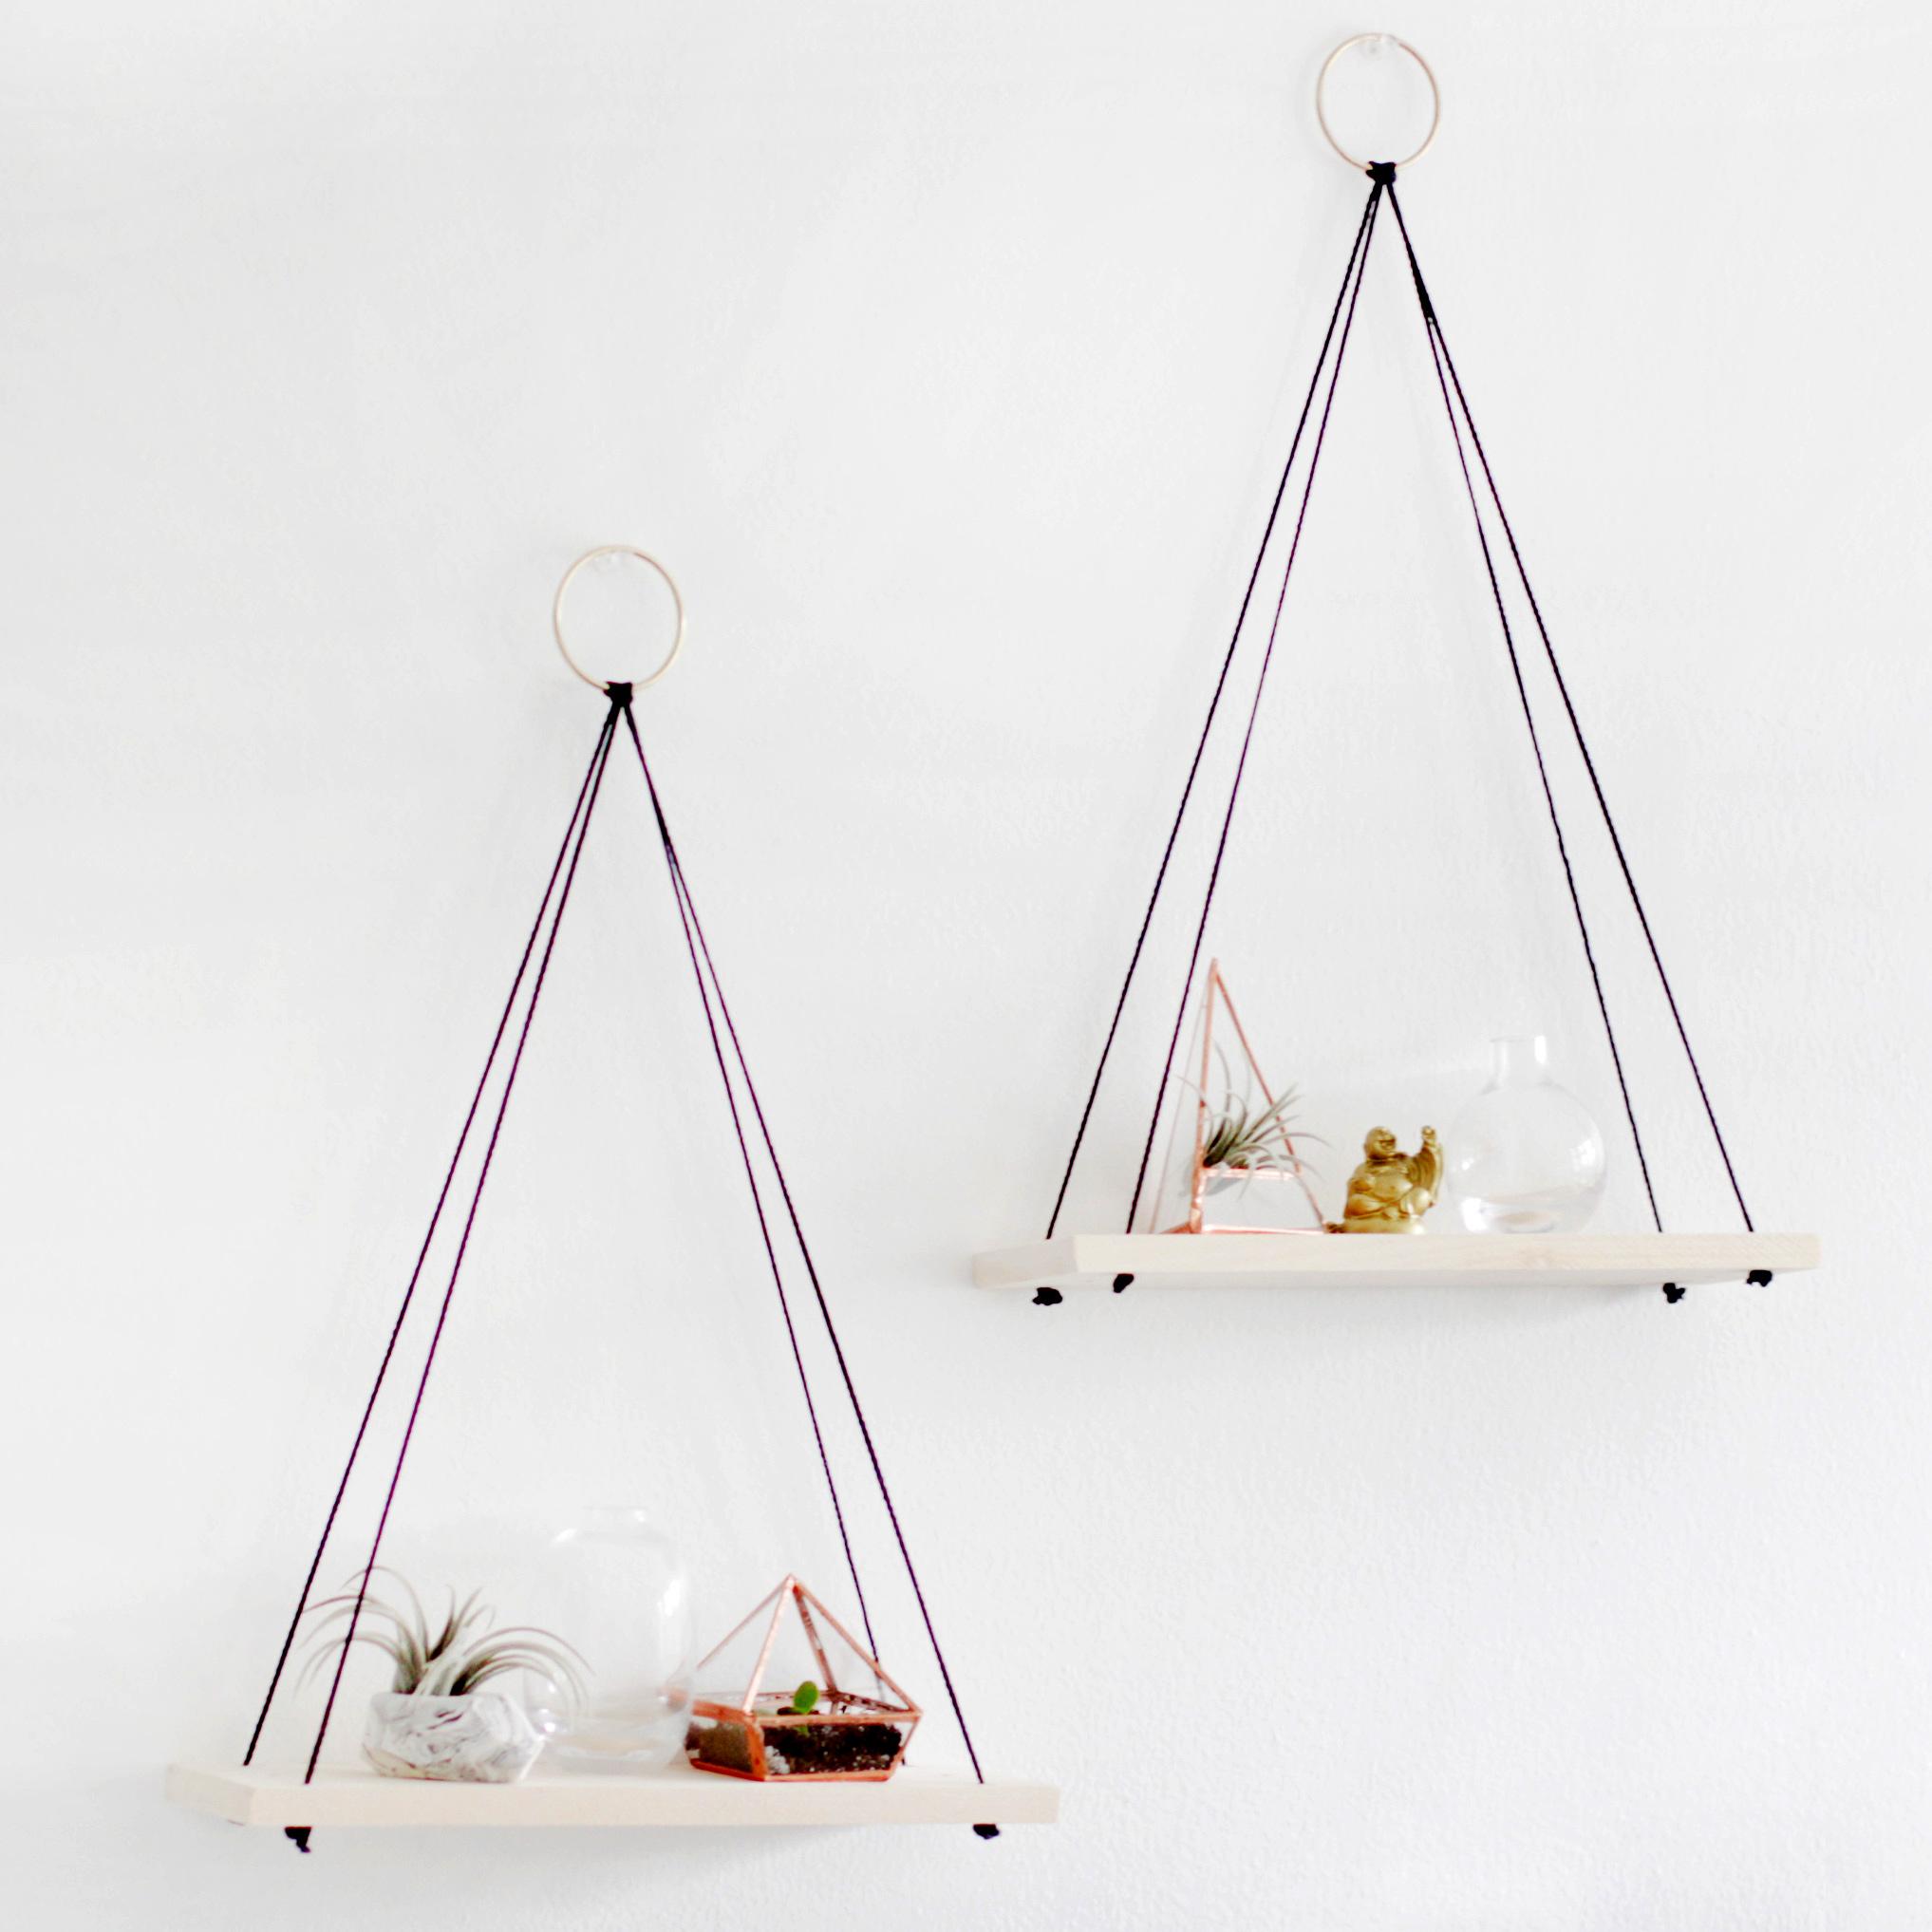 Hanging Shelves diy hanging shelves – why don't you make me